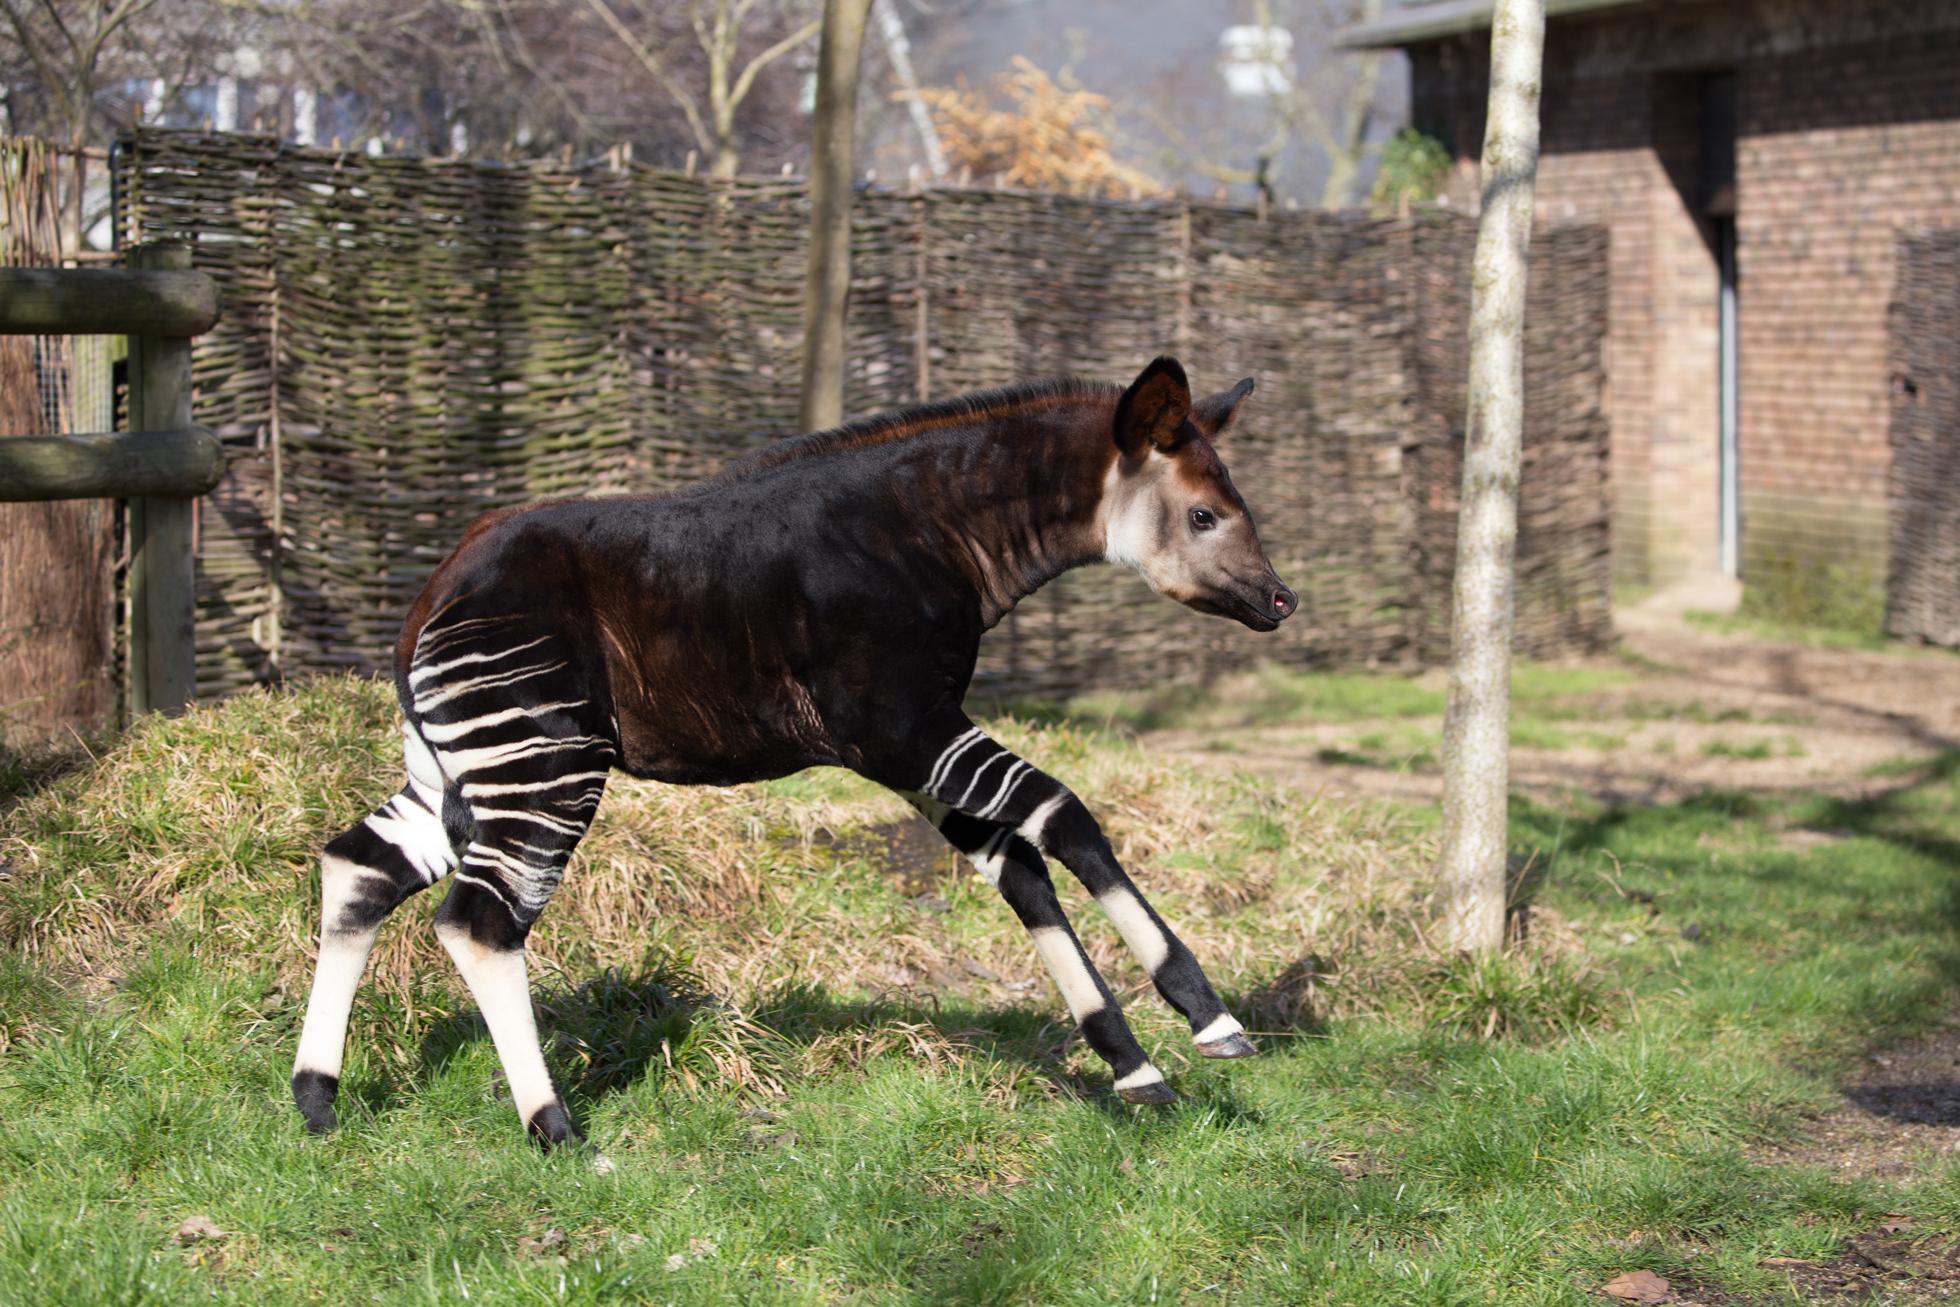 Okapi calf frolicking in zoo